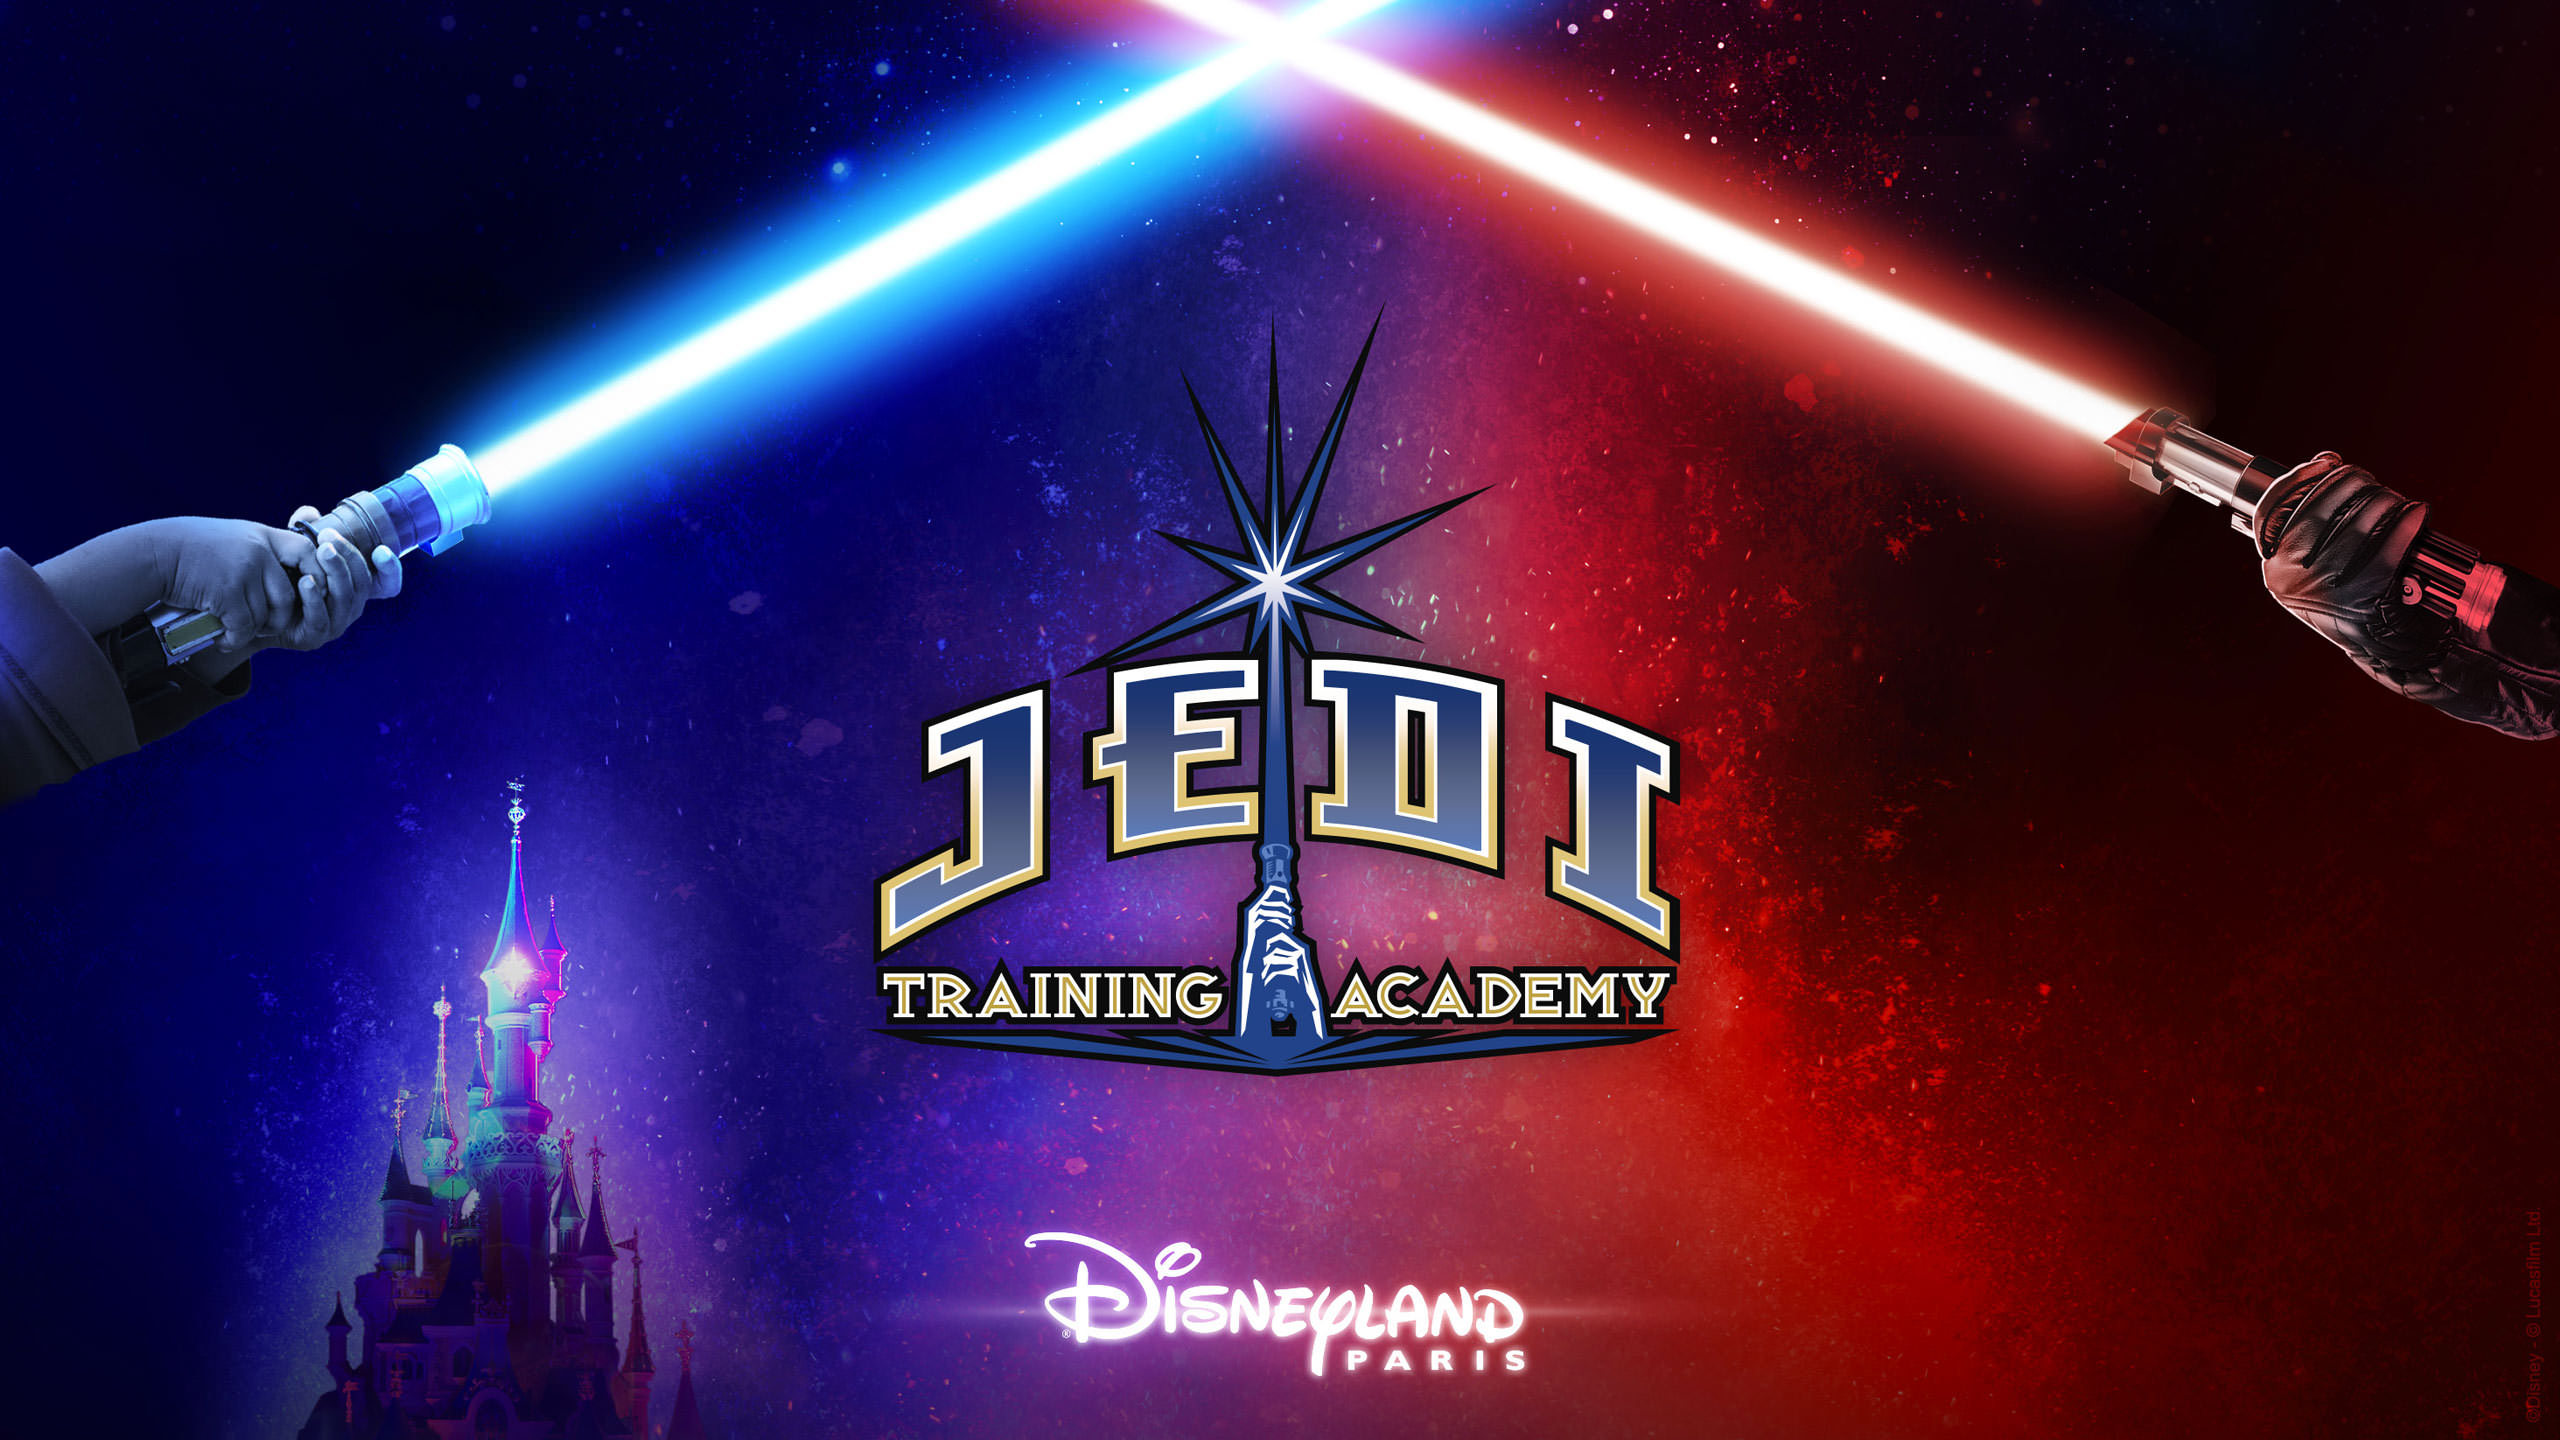 hd12934_2050jan31_Jedi-training-academy_16-9